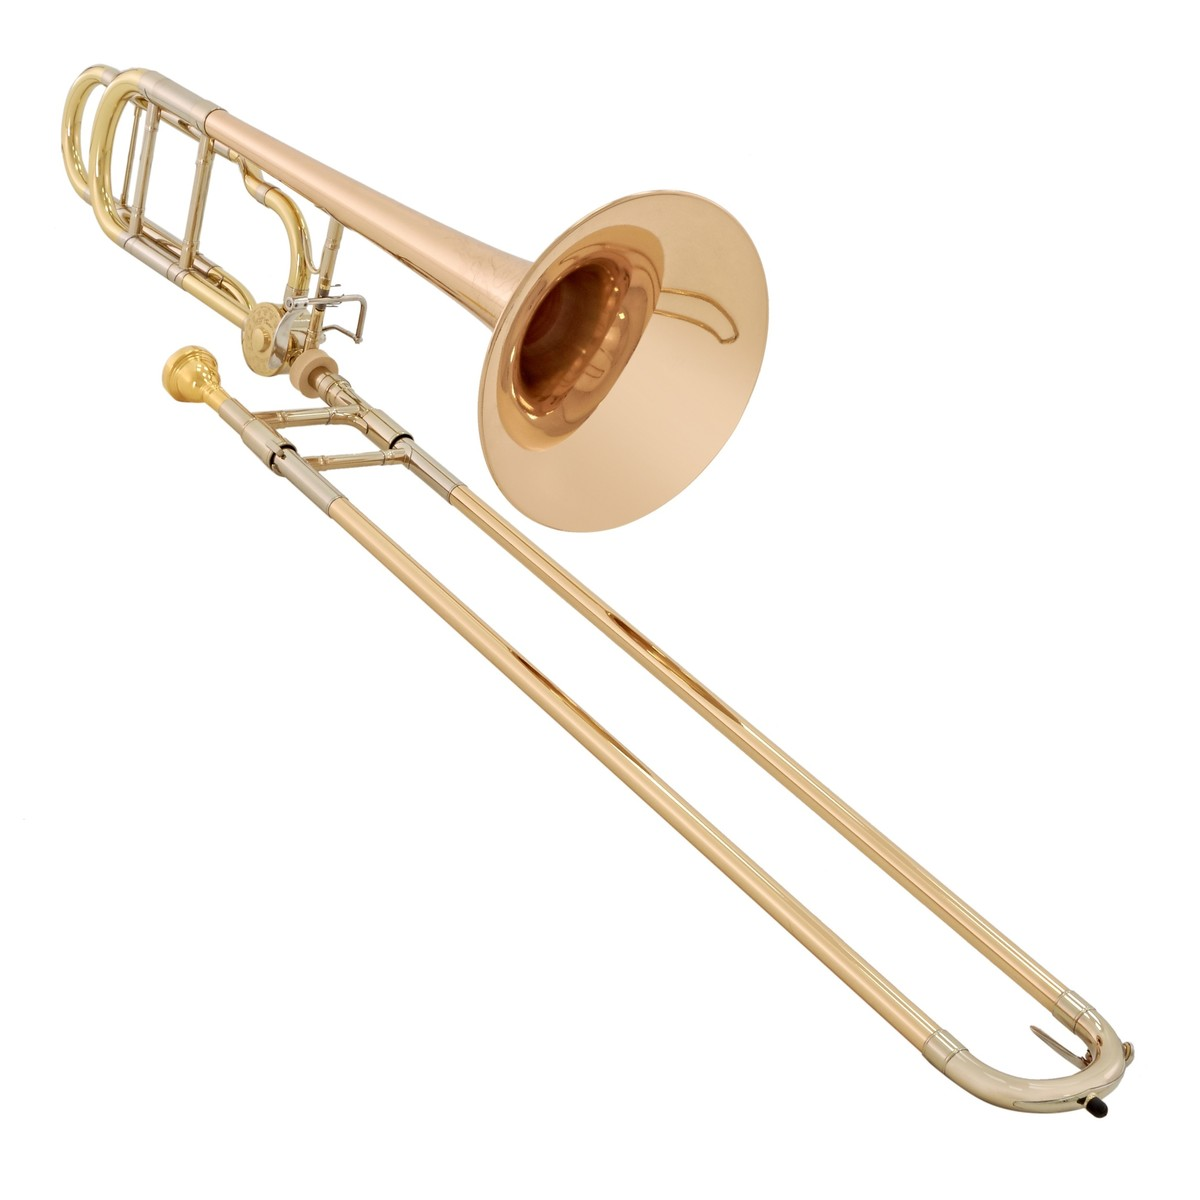 Conn 88HCL Bb/F Tenor Trombone